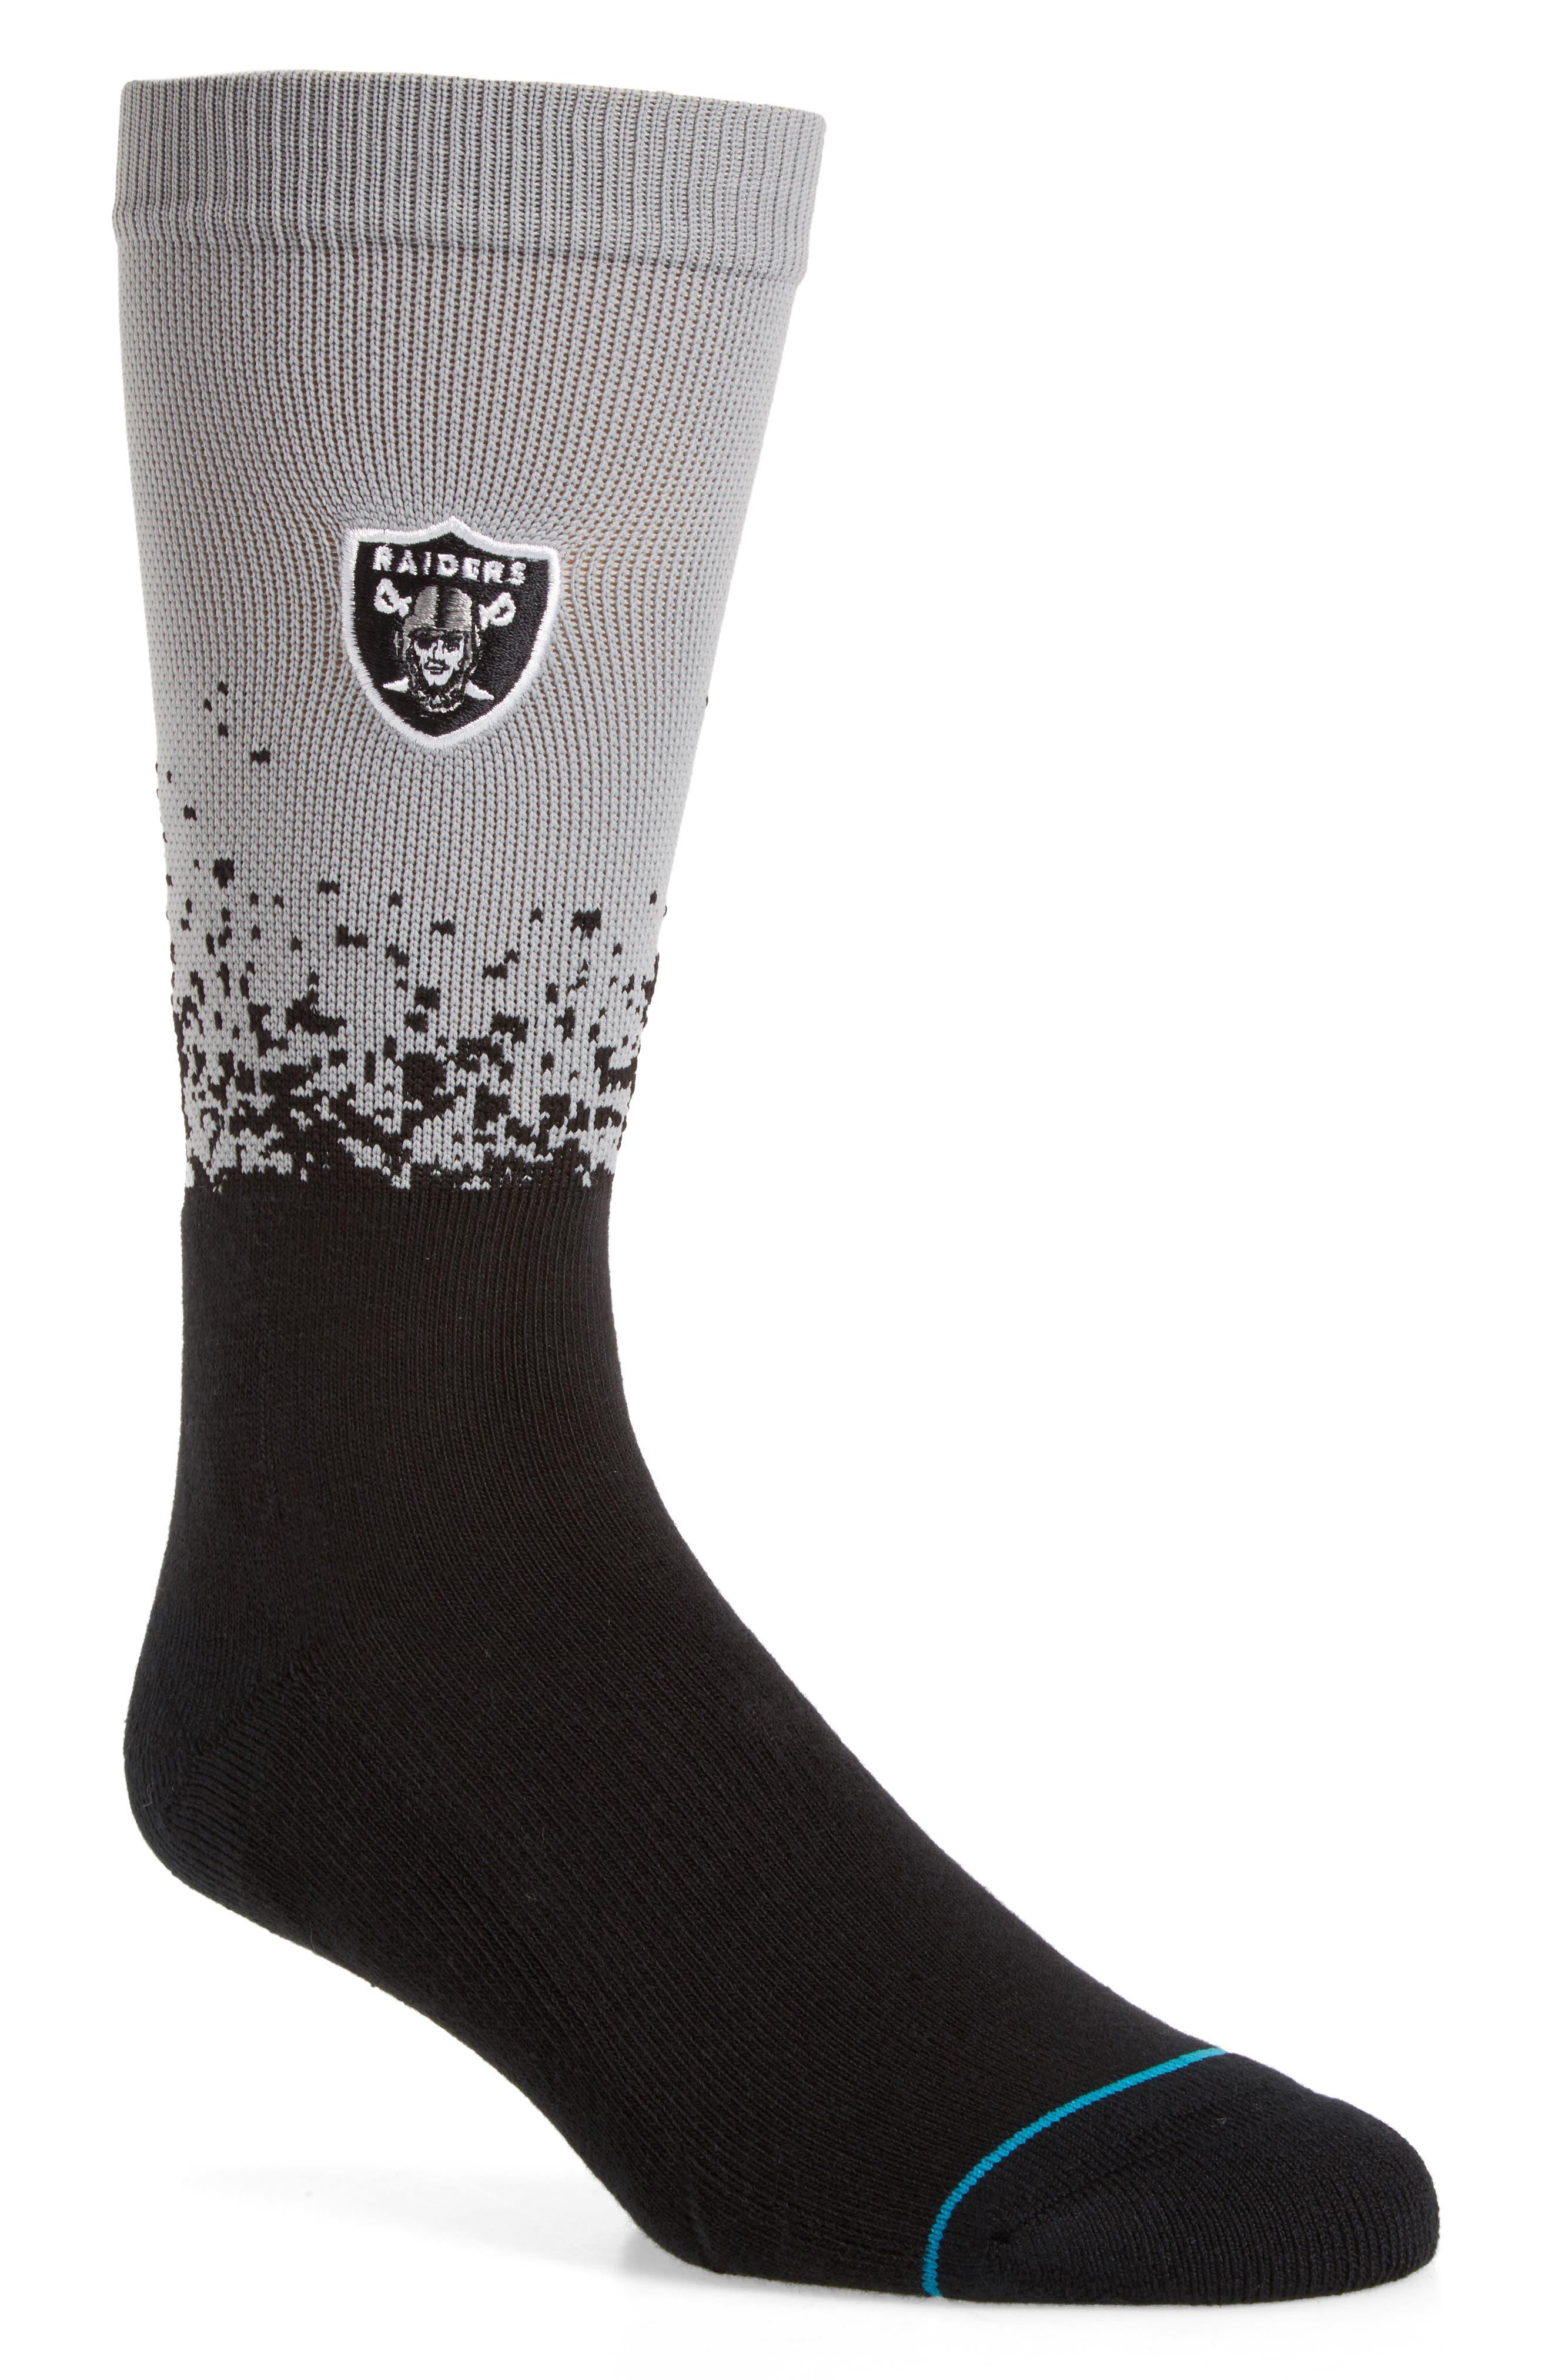 Oakland Raiders - Fade Socks,                         Main,                         color,